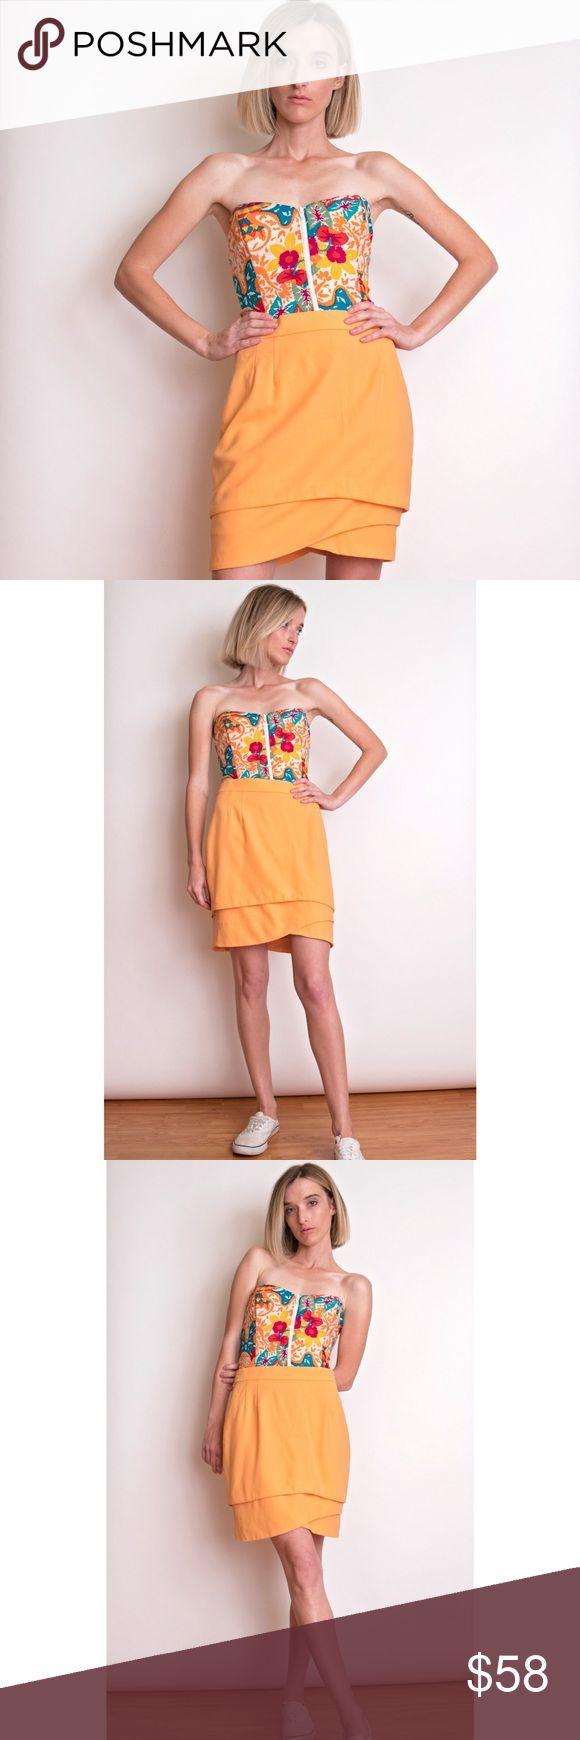 Escada coral orange asymmetrical wool mini skirt ESCADA coral orange mini skirt. Asymmetrical wave layered structure. 100% virgin wool. Size 36 euro  Waist-26 Hips-32 Length-19 Escada Skirts Mini